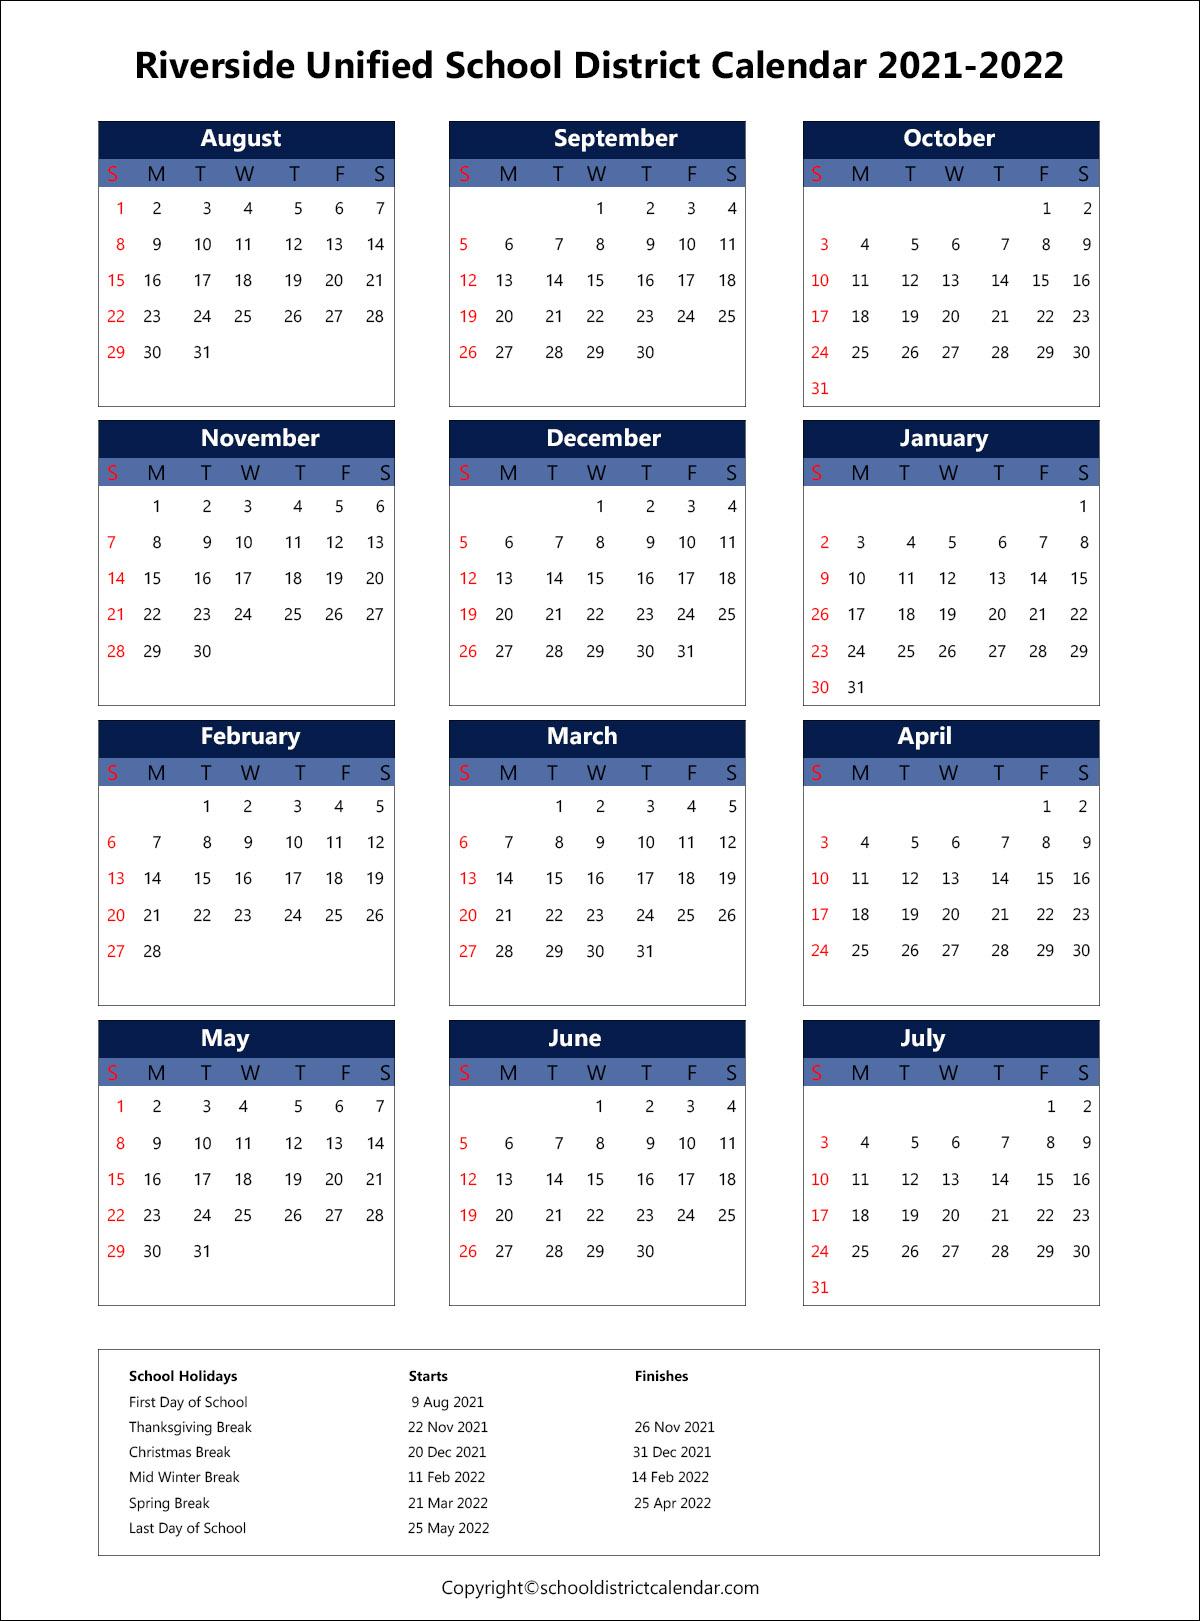 Riverside Unified School District Calendar 2021